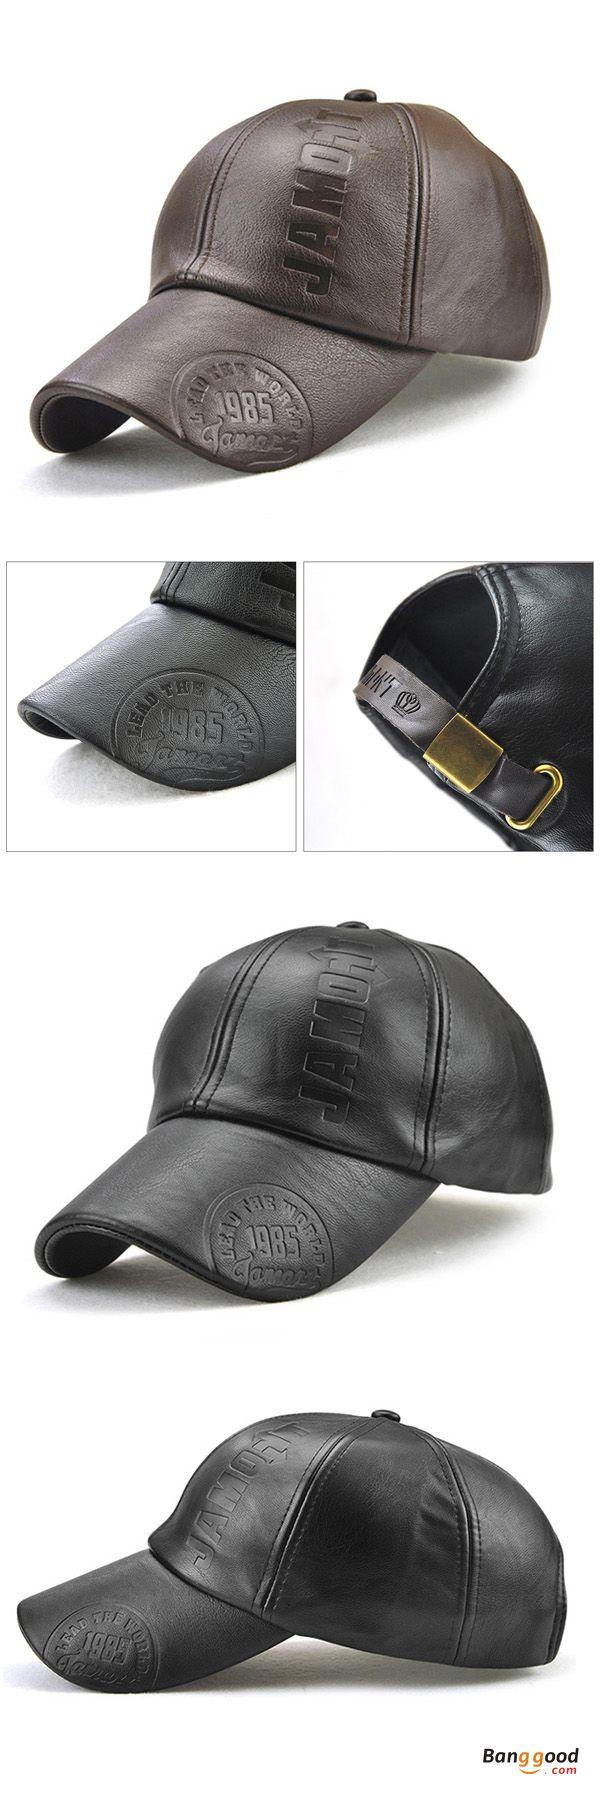 Warm&Fashion, Outdoor&Sport, Man-made Leather, Adjustable, Baseball Cap, Snapback Hat. Shop now~